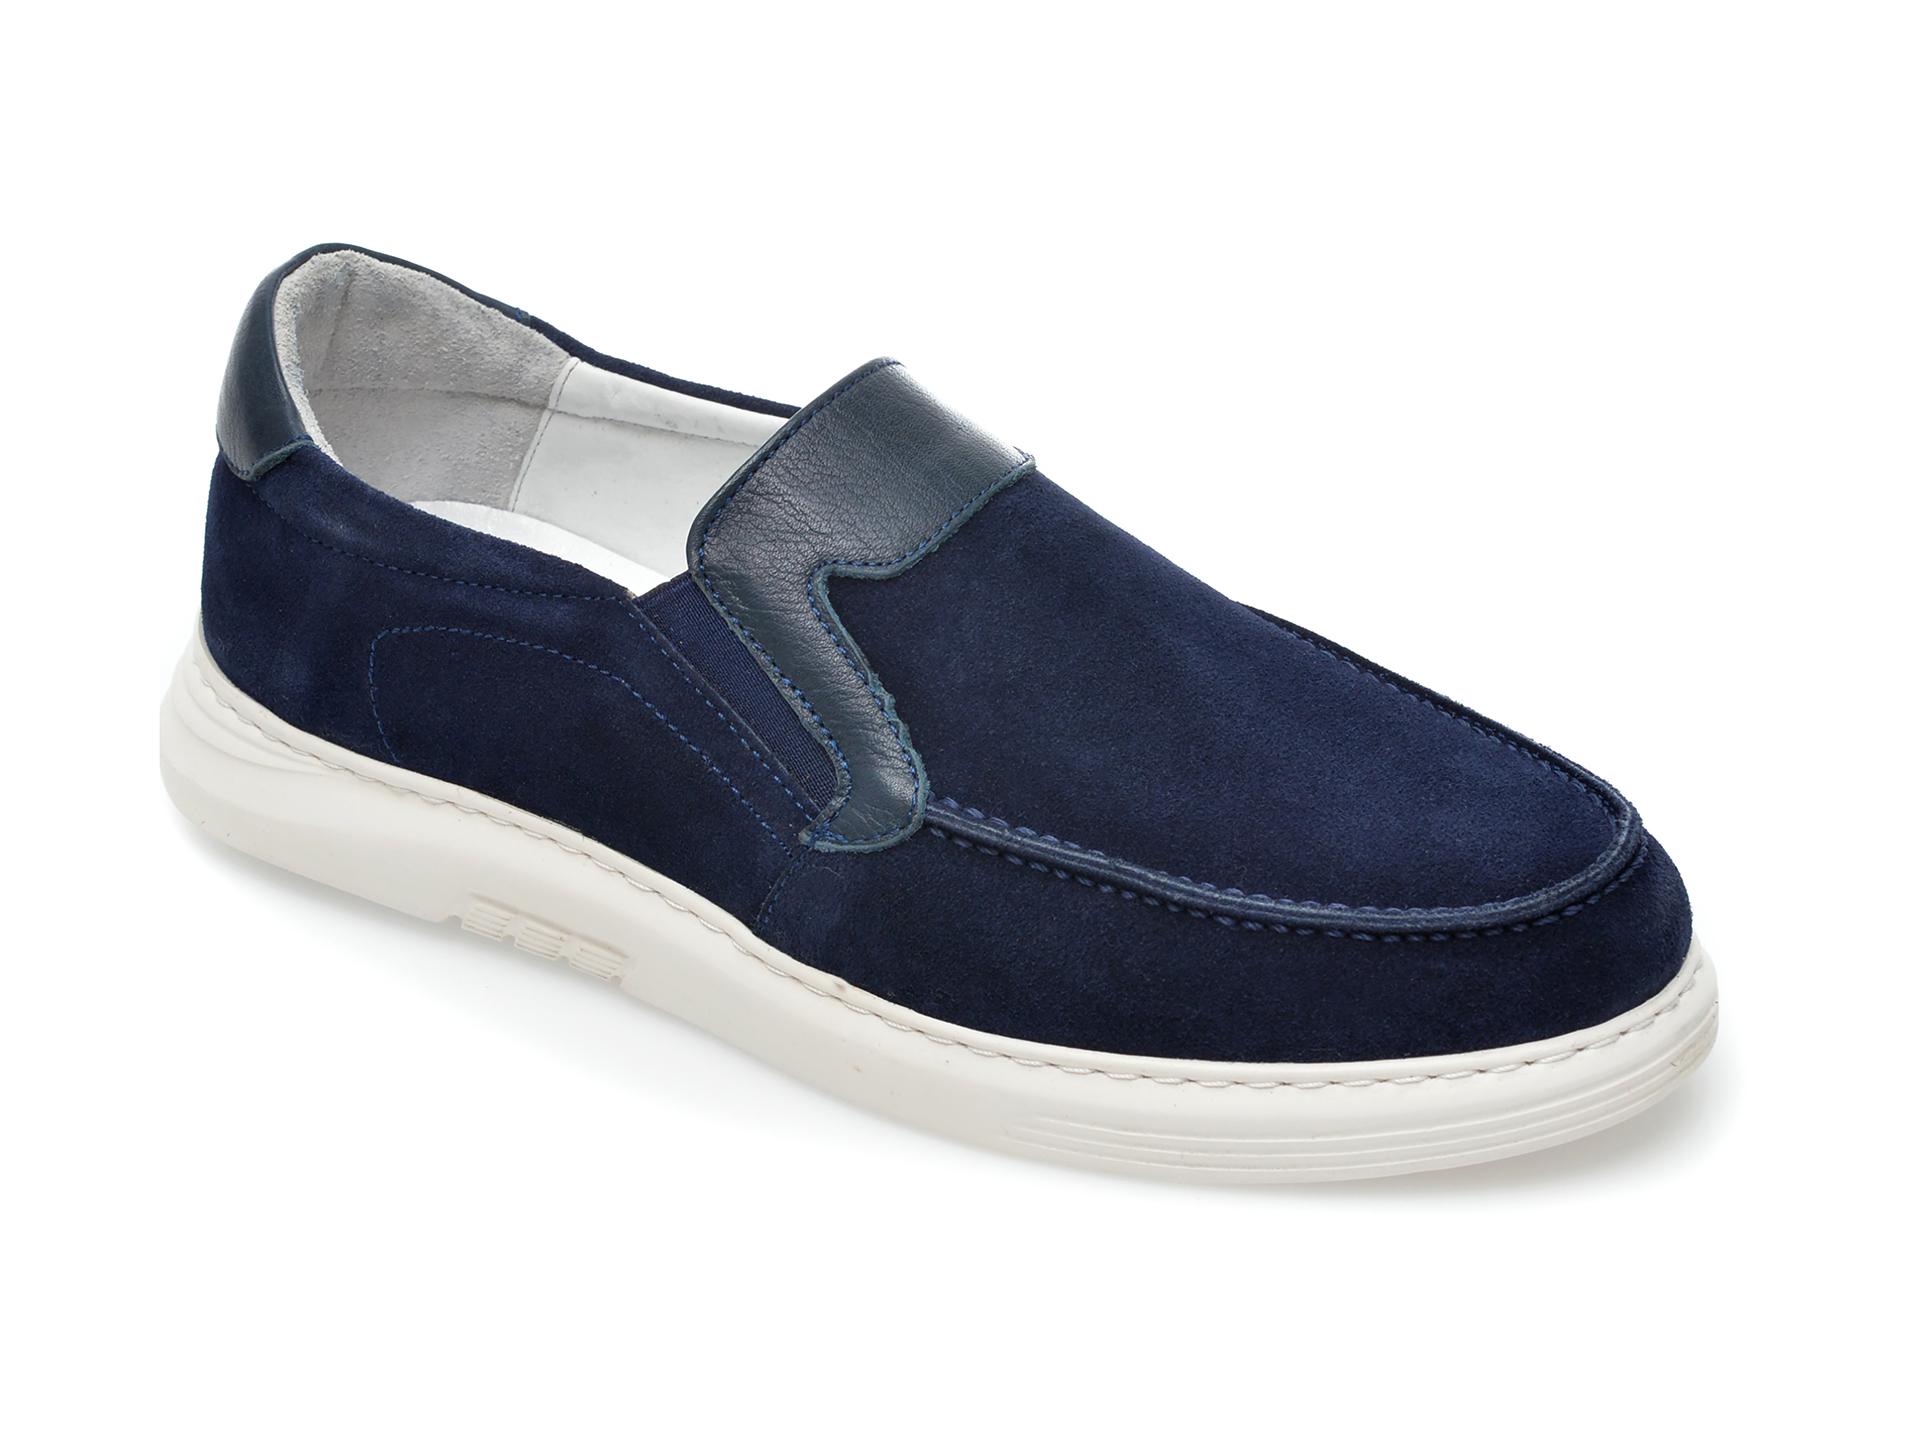 Pantofi OTTER bleumarin, 2022, din piele intoarsa imagine